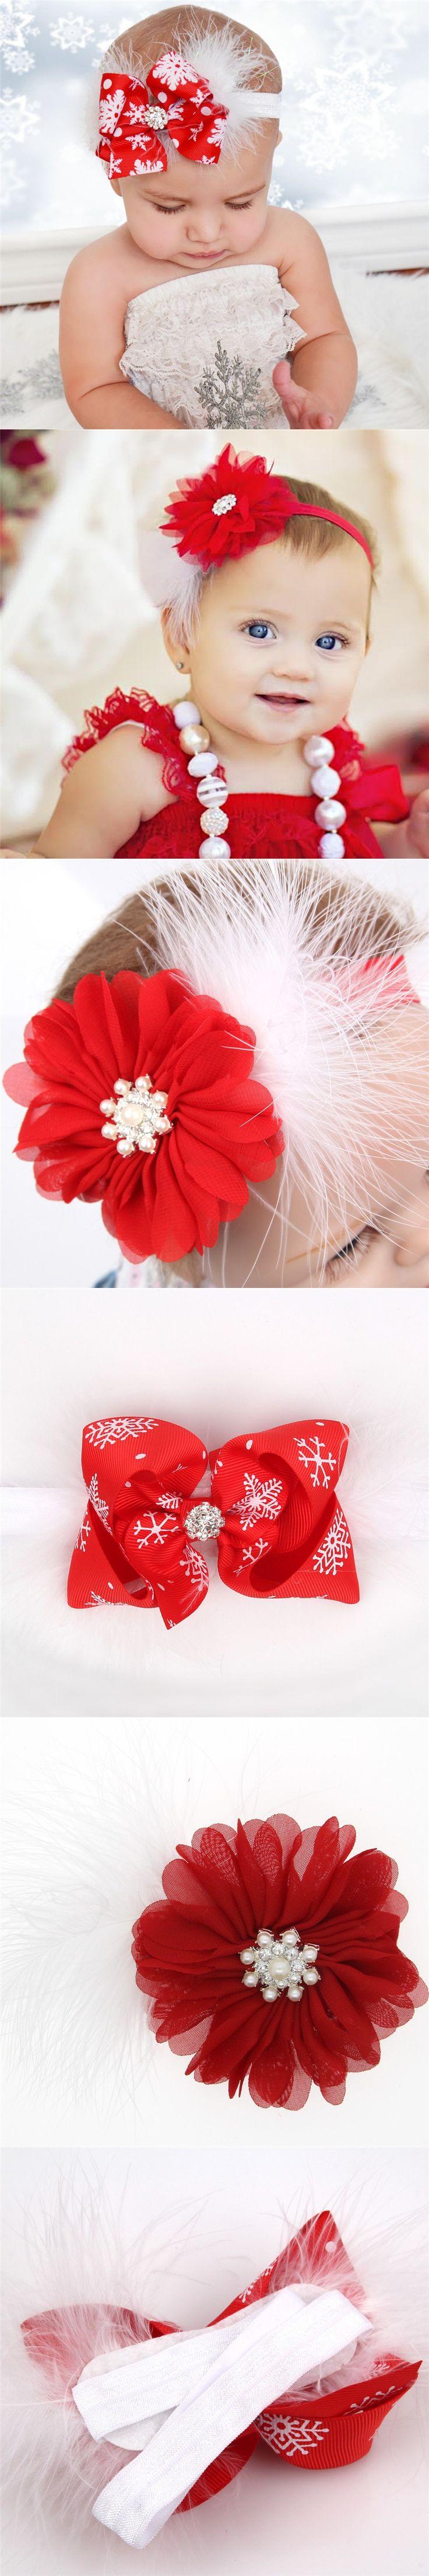 Baby Christmas elastic Headband Feather Bow Snow Flower Girls HairBand Toddler Headwear headdress Hair Accessories $1.08